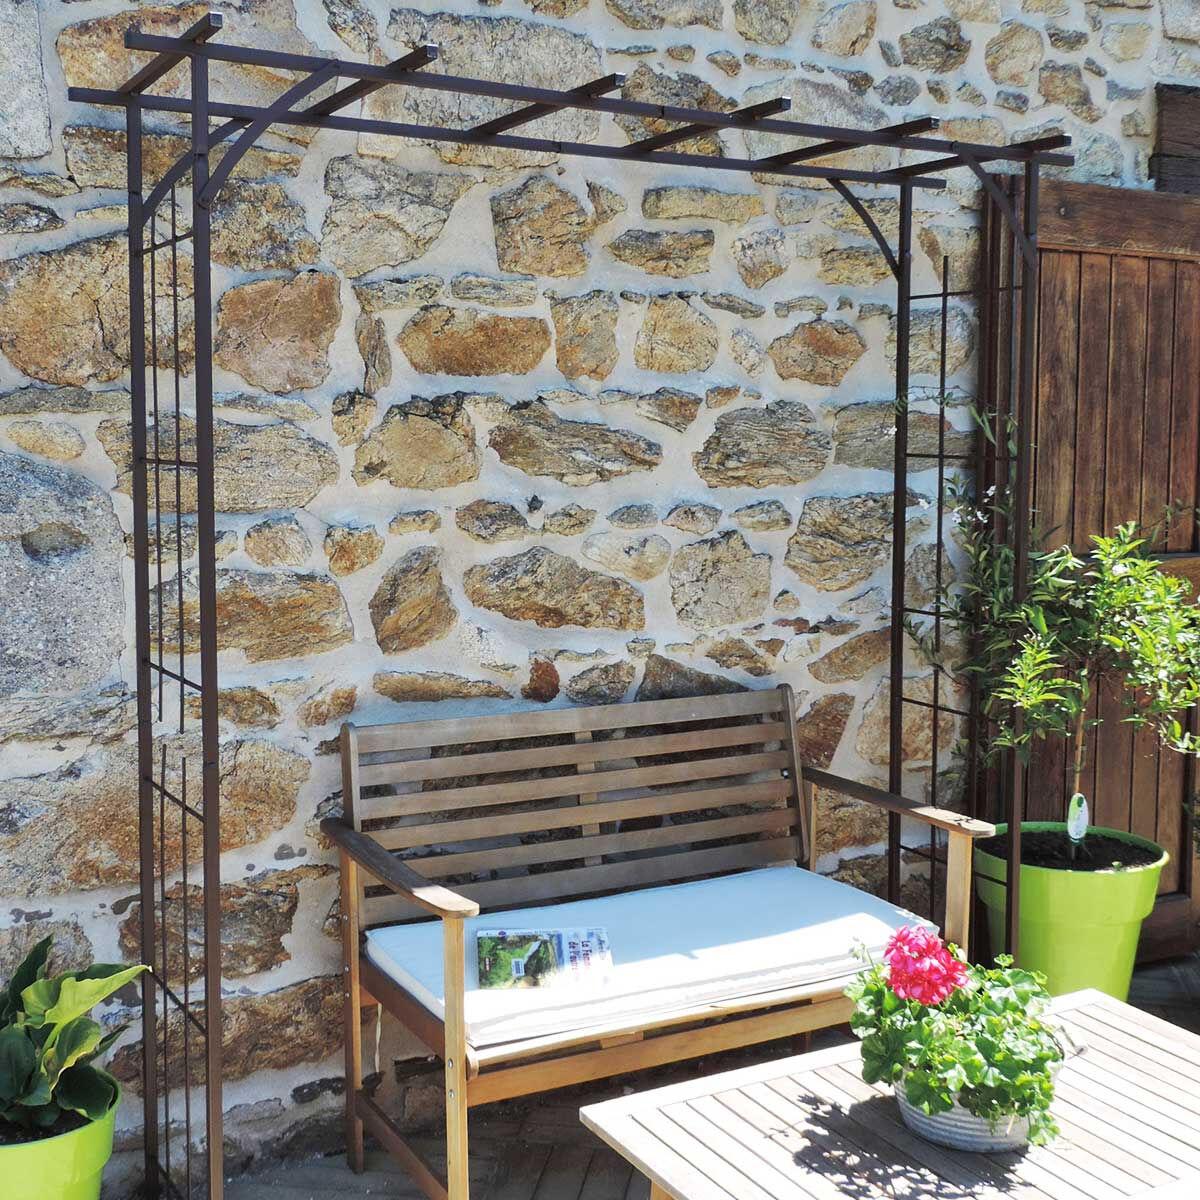 LMOULIN Arche de jardin en fer grand modèle - Louis Moulin